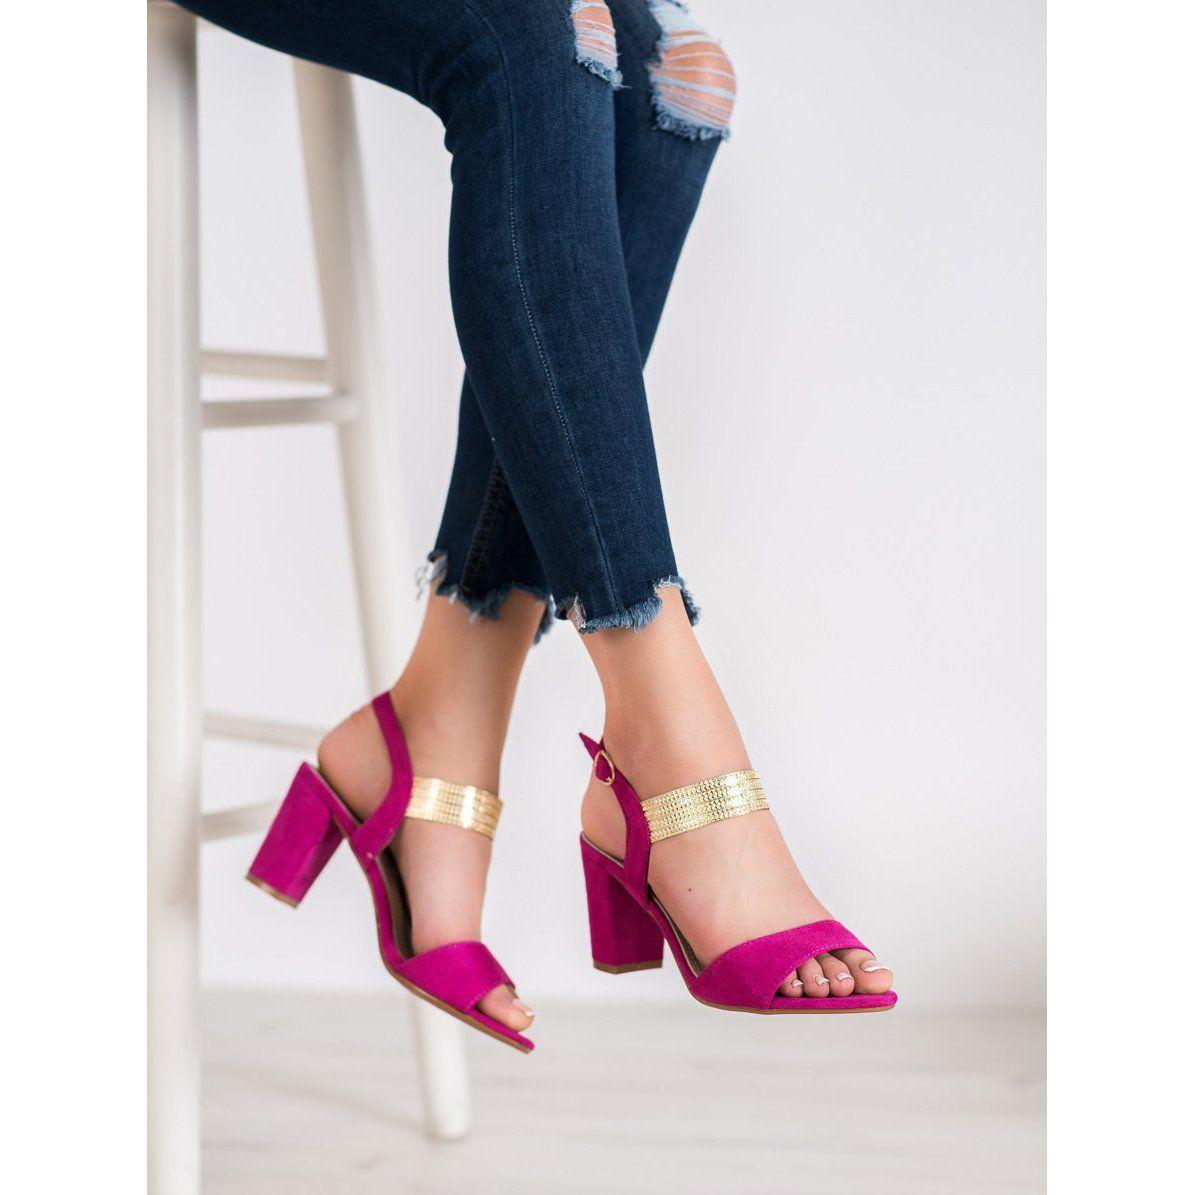 Filippo Eleganckie Sandaly Na Slupku Rozowe Heels Shoes Pumps